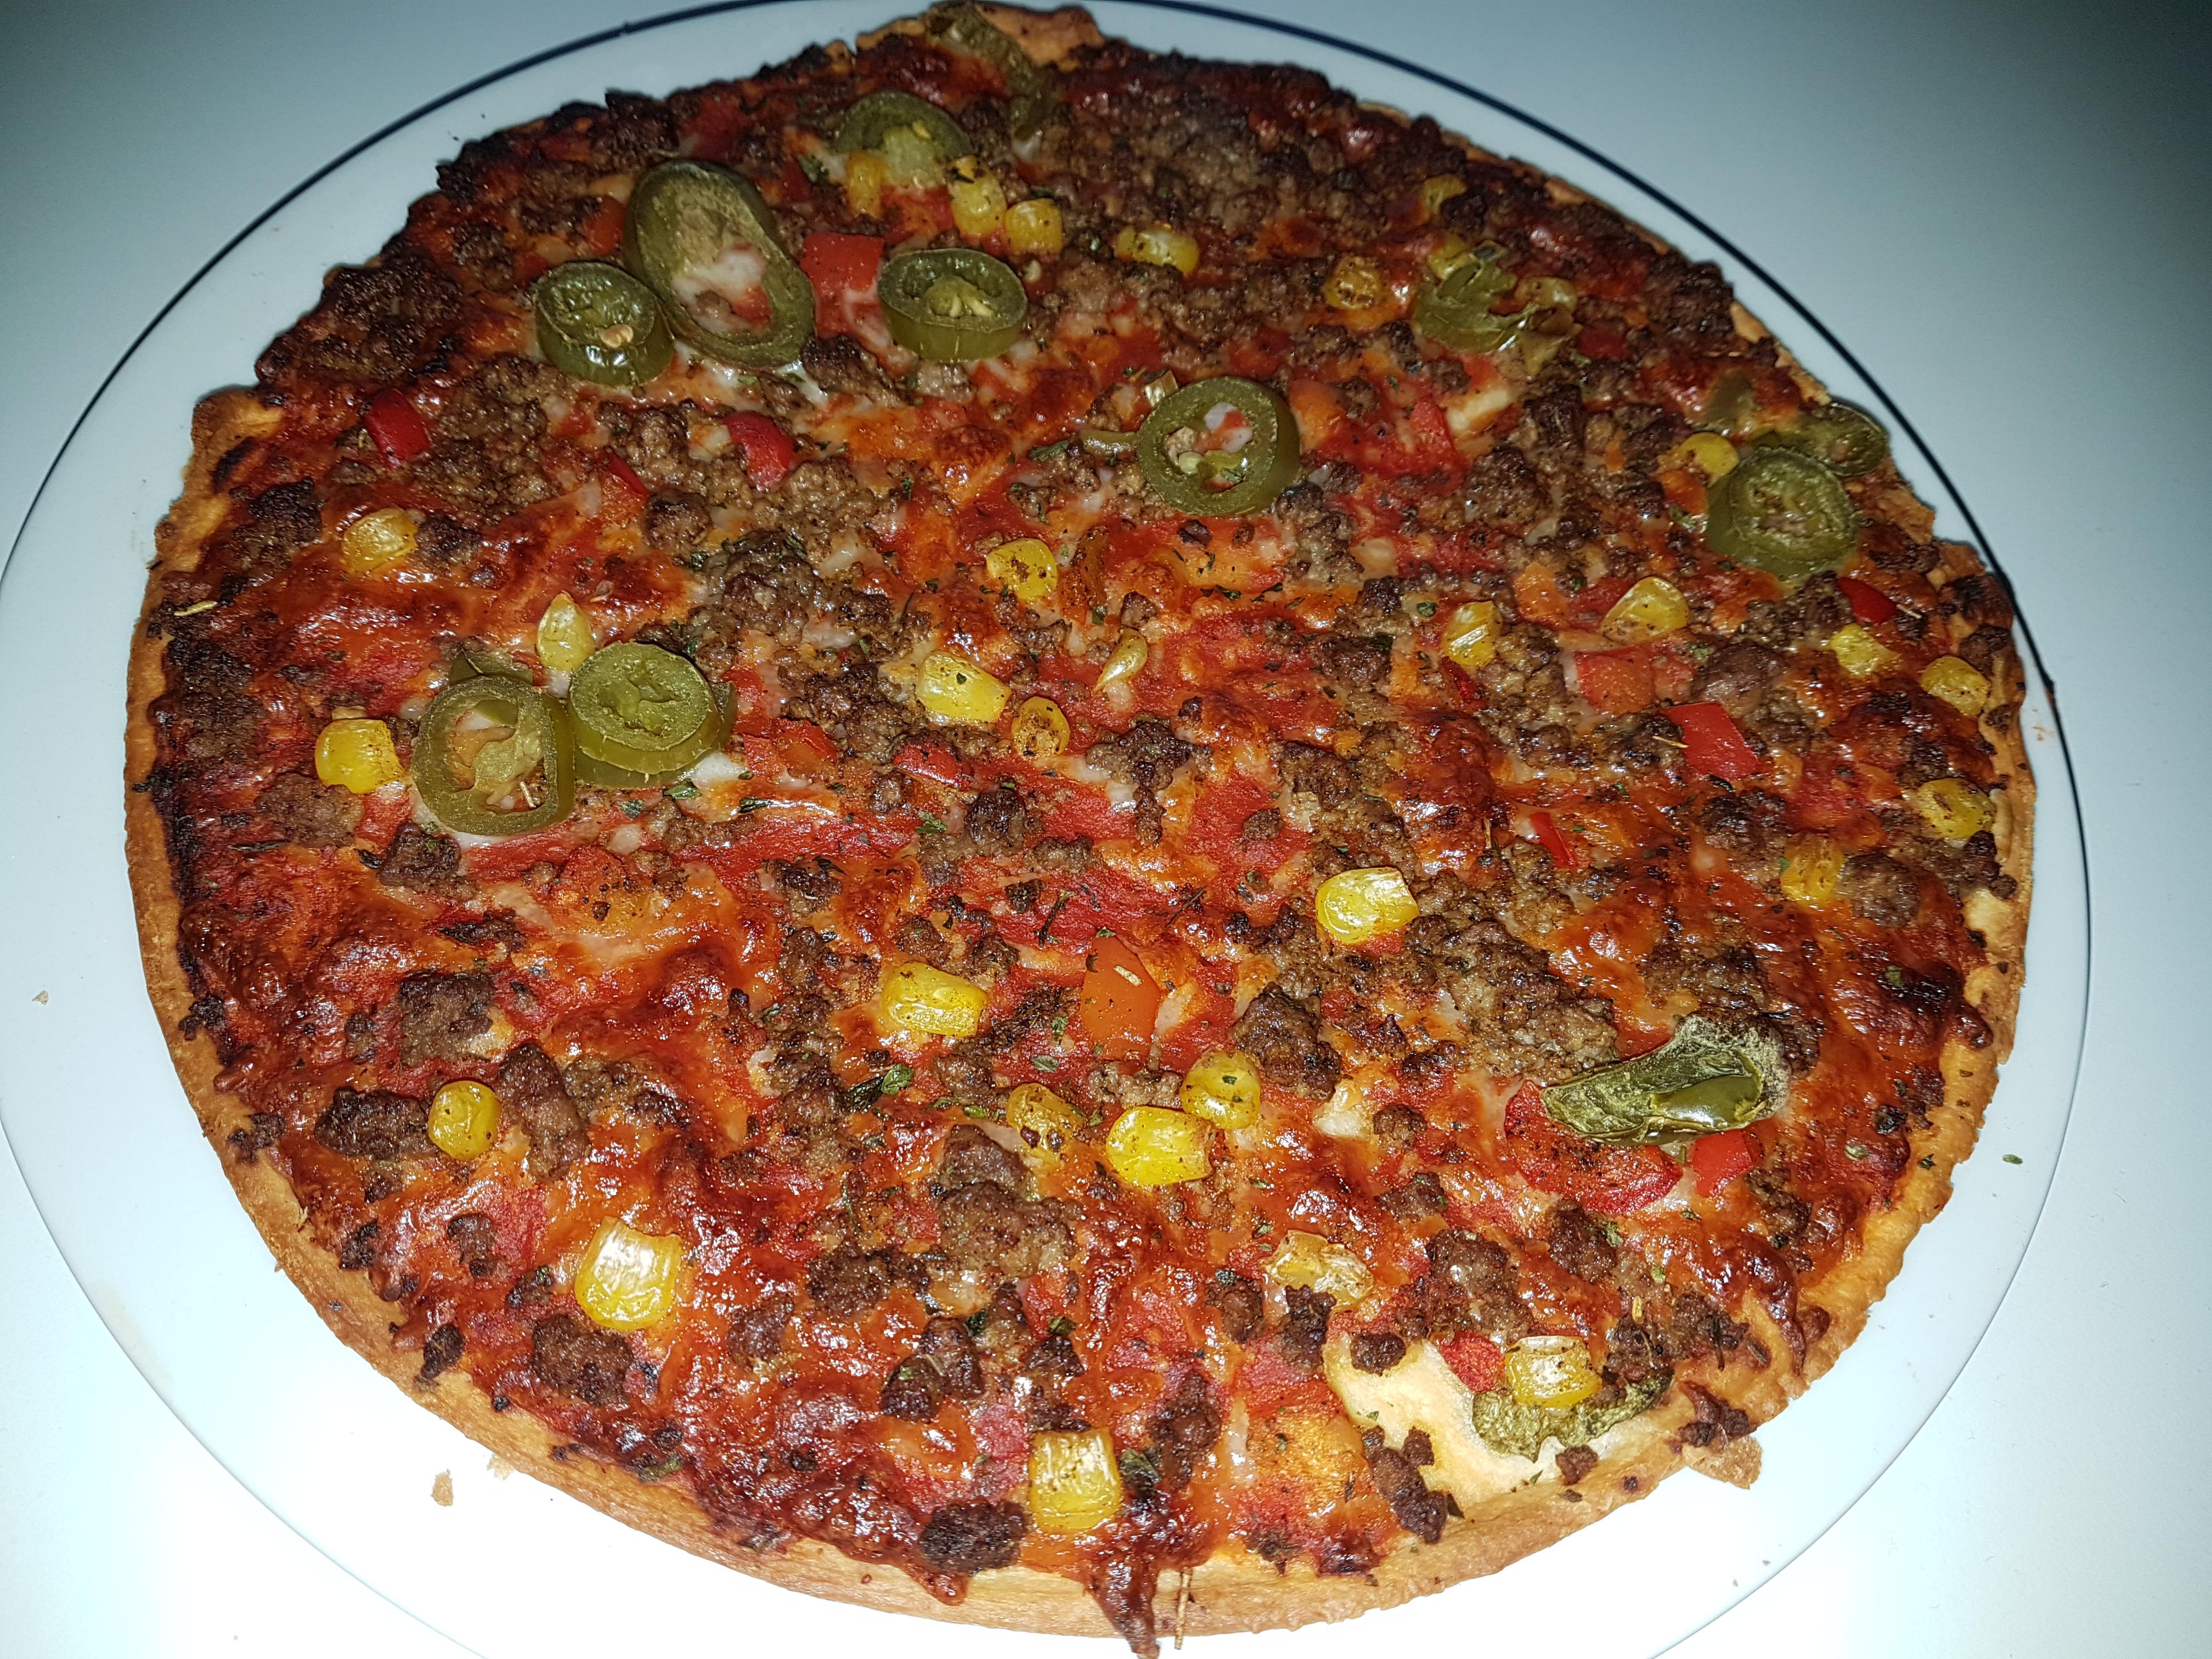 http://foodloader.net/Holz_2018-01-03_Pizza.jpg